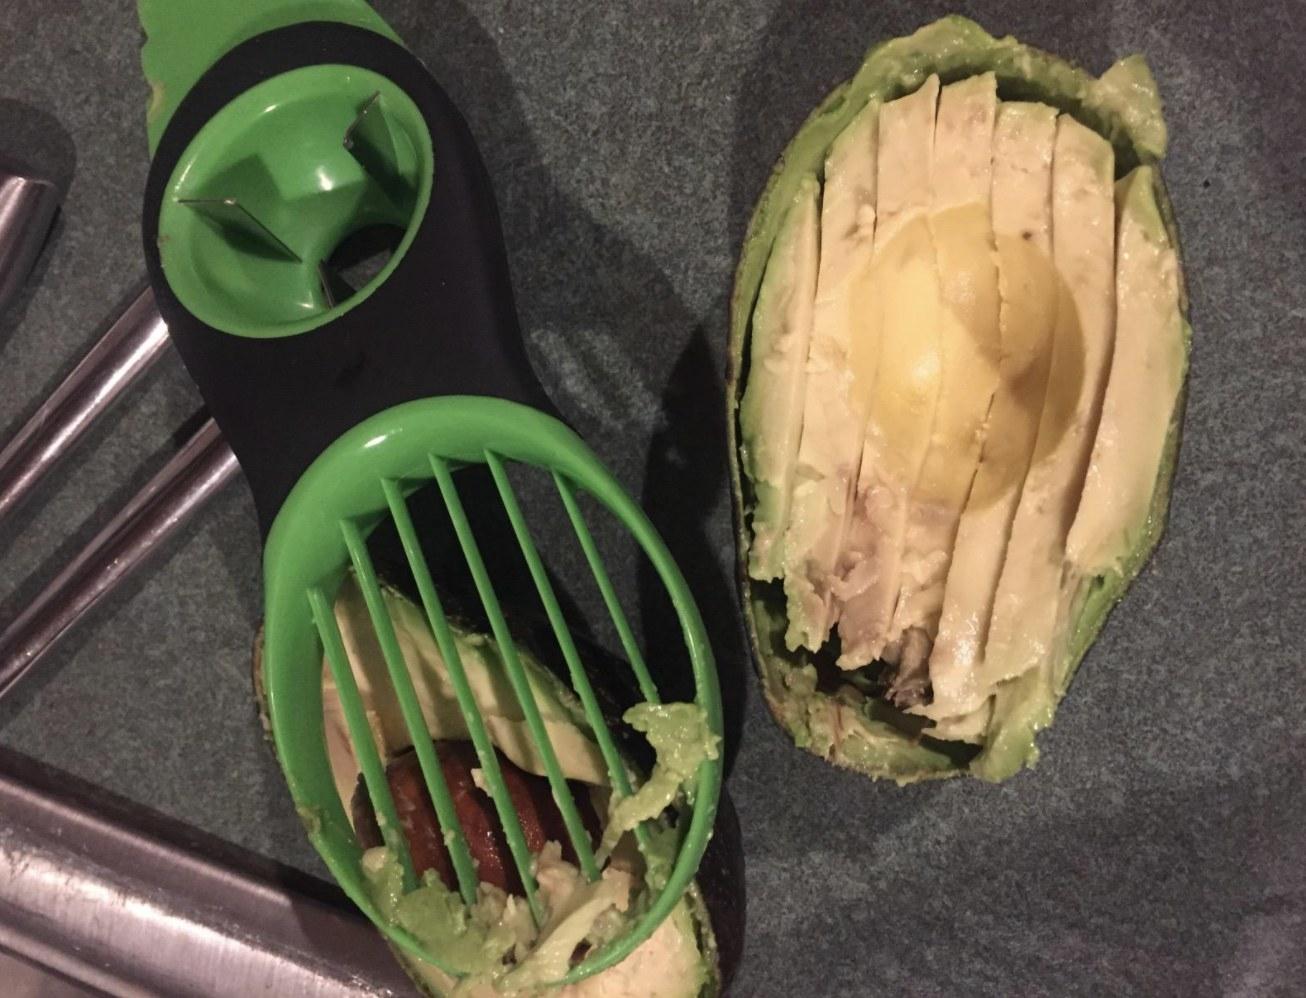 The avocado slicer next to an avocado